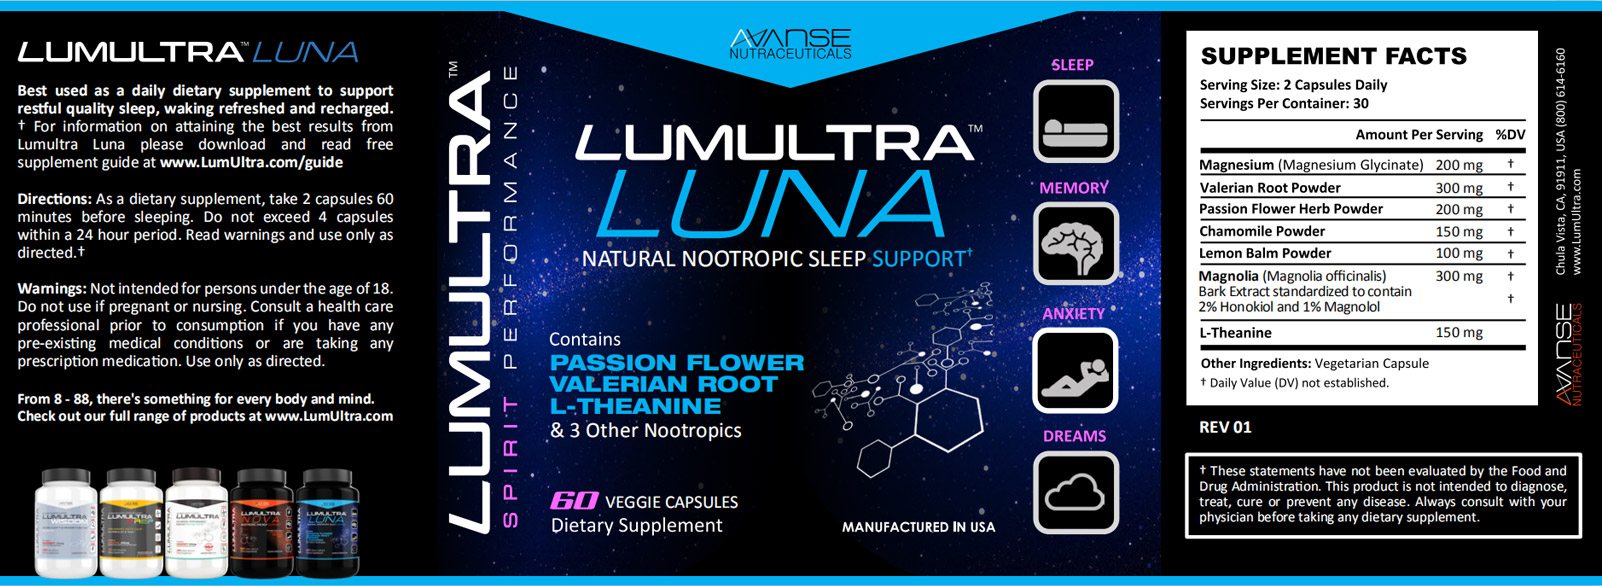 LumUltra Luna